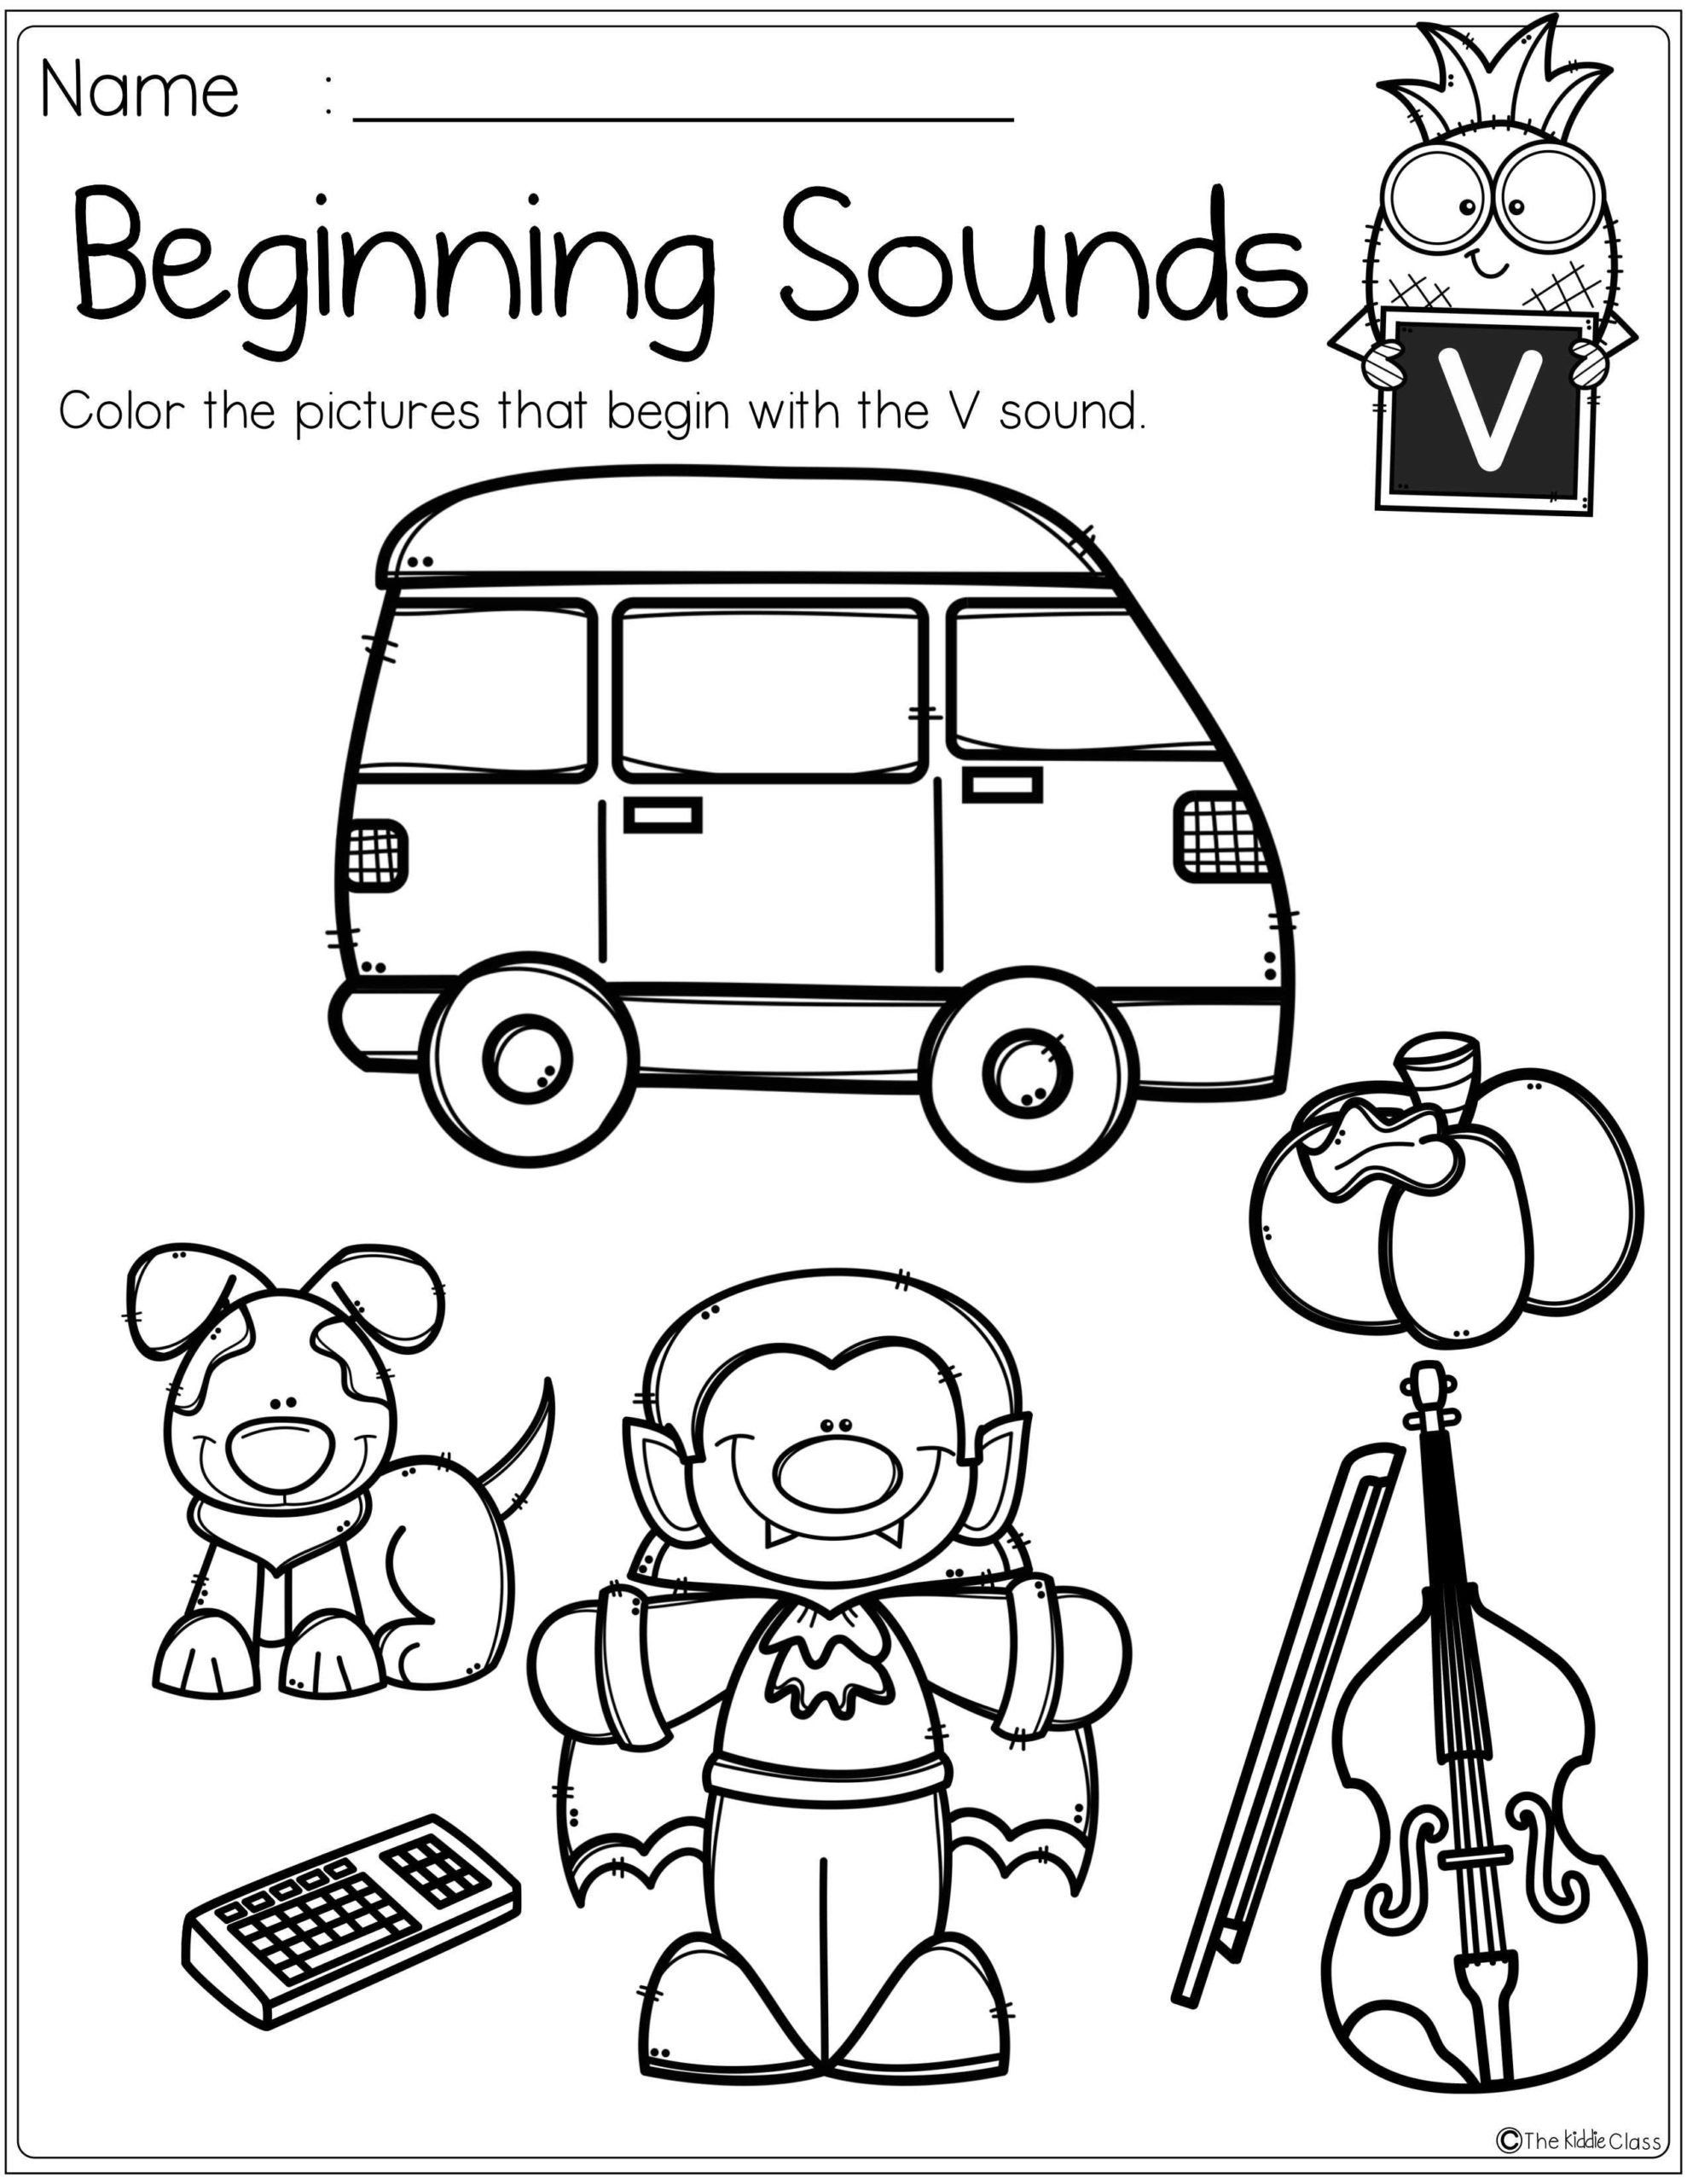 Analogies Worksheets Middle School Cool 4 Kid Math Games Letter V Worksheets For Kindergarten Beginning Sounds Phonics Homeschool Programs [ 2560 x 1978 Pixel ]